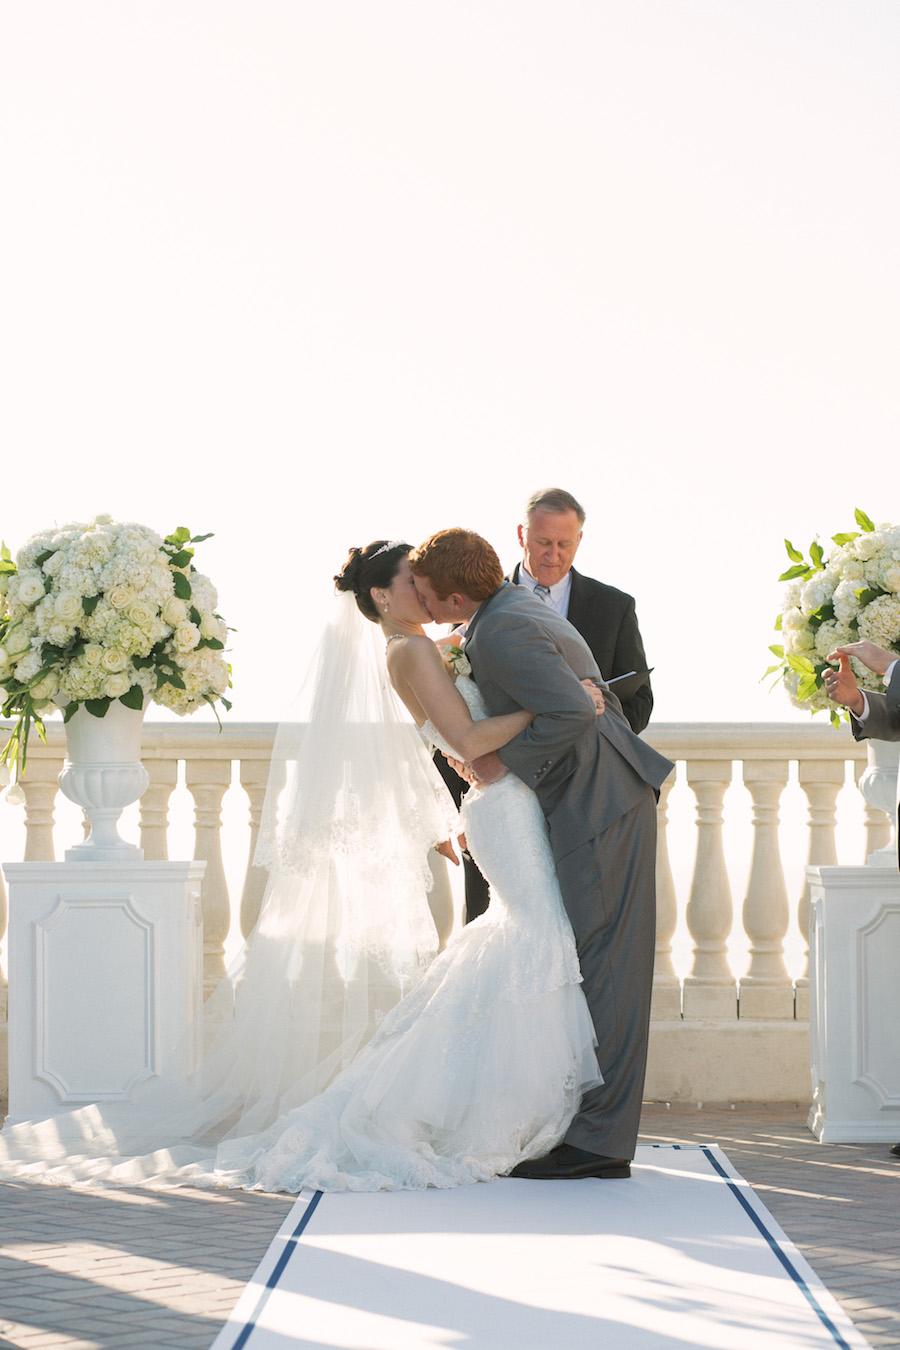 Bride and Groom Wedding Ceremony Kiss   Classic, Elegant White Wedding Ceremony Decor Flowers on Pedestal   Clearwater Beach Hotel Wedding Venue   Hyatt Regency Clearwater Sky Terrace Outdoor Ceremony